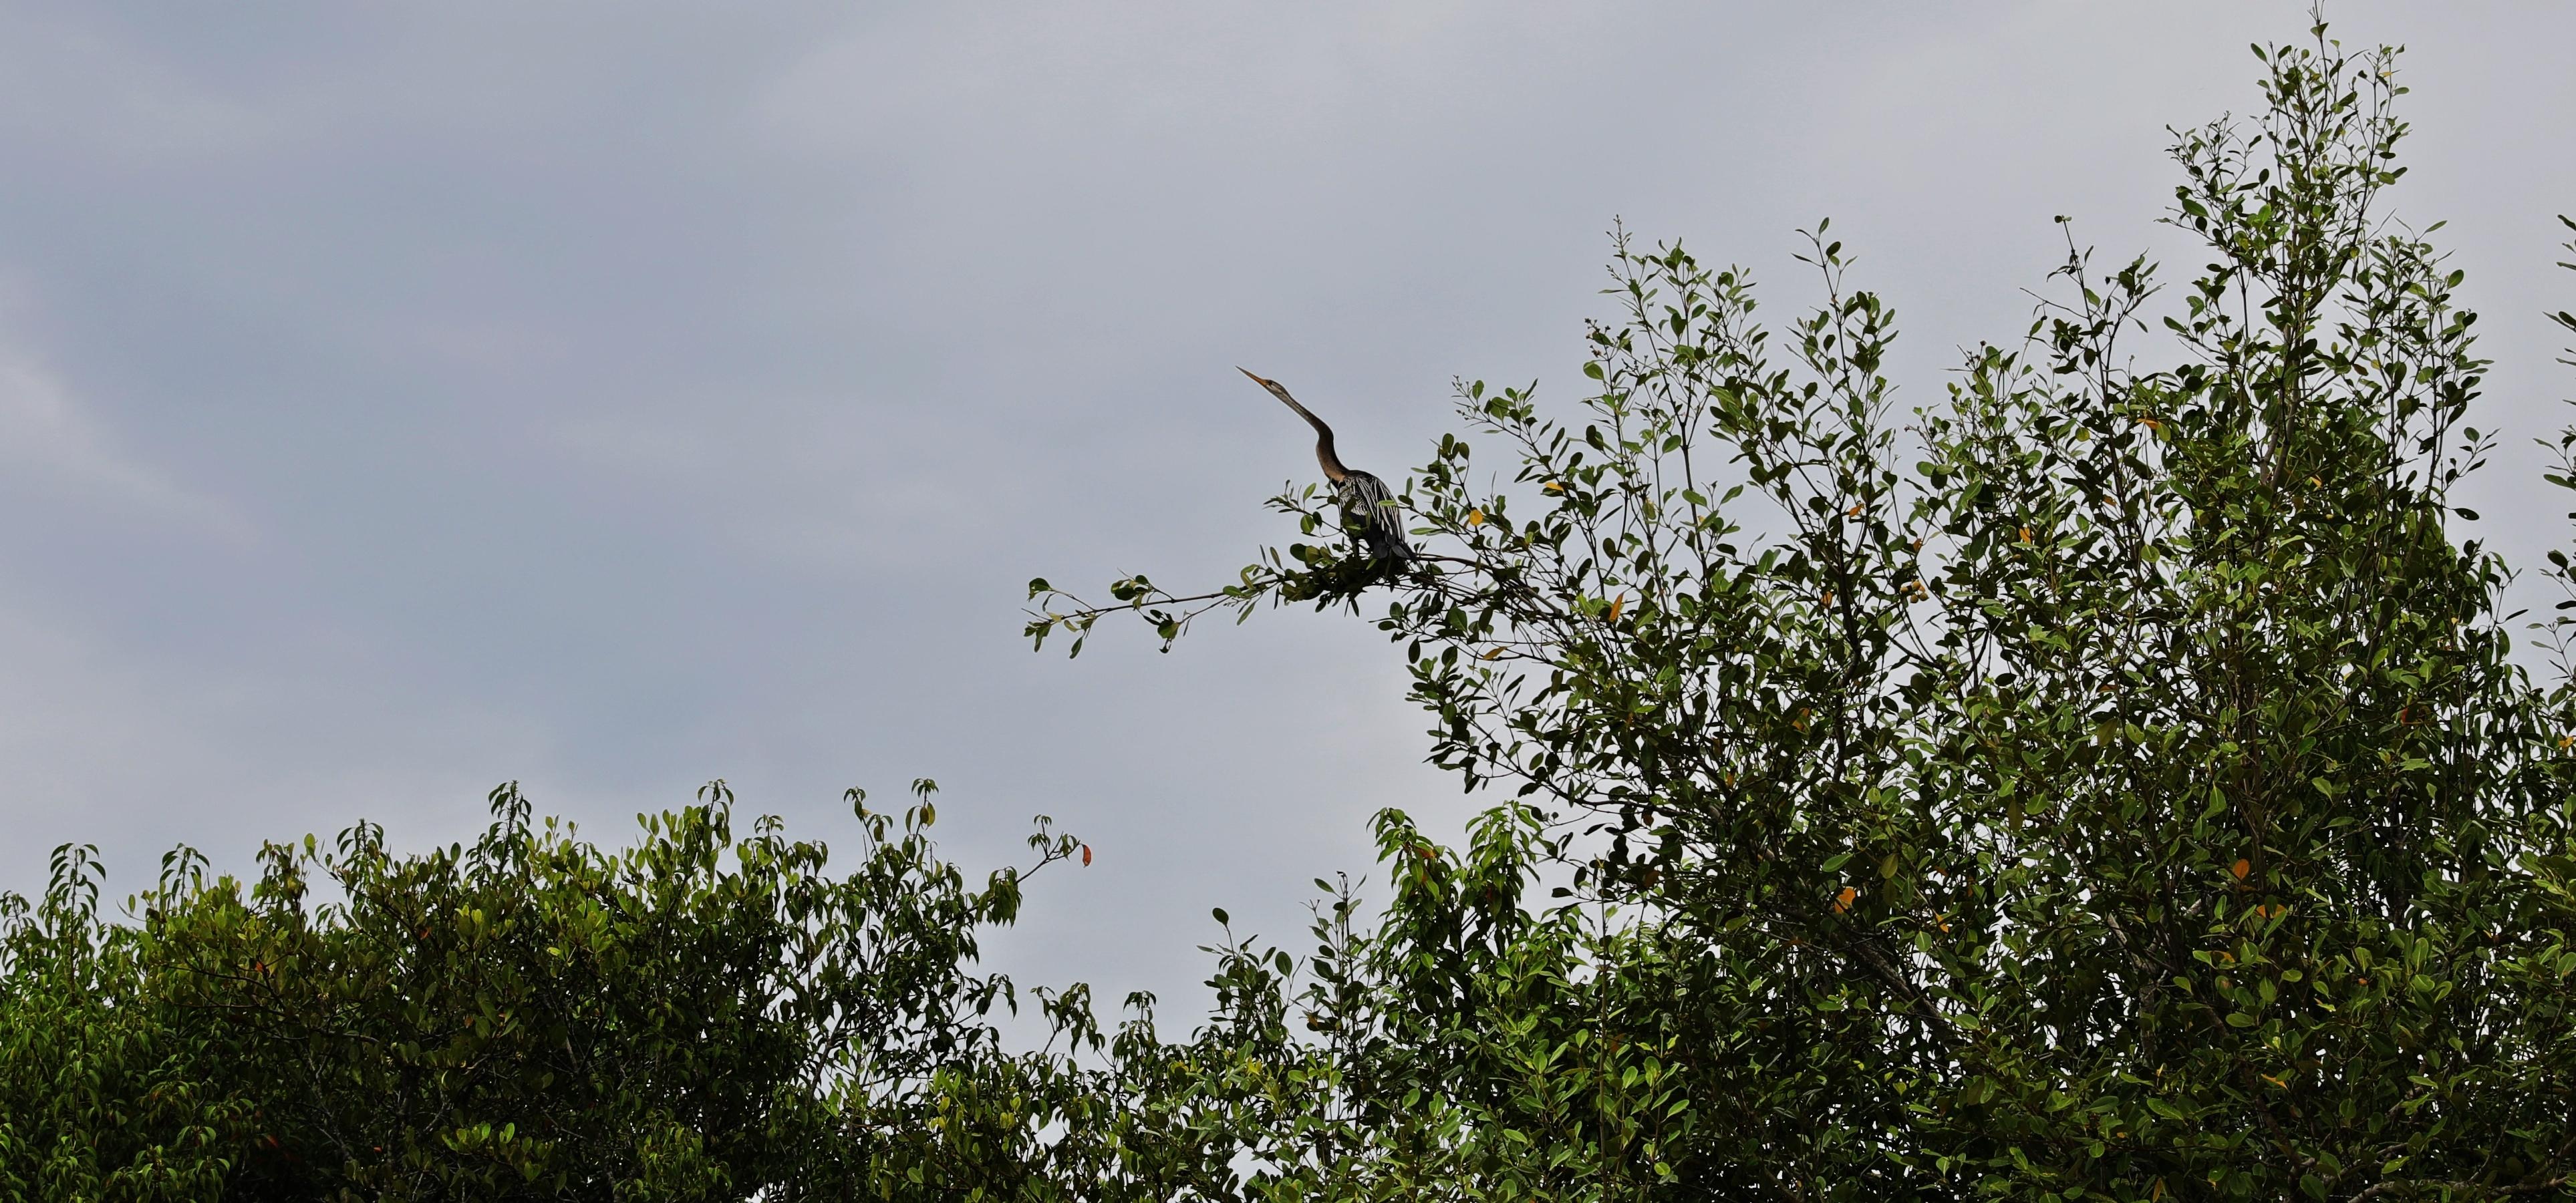 Cormorant, Tangalle Lagoon, Sri Lanka